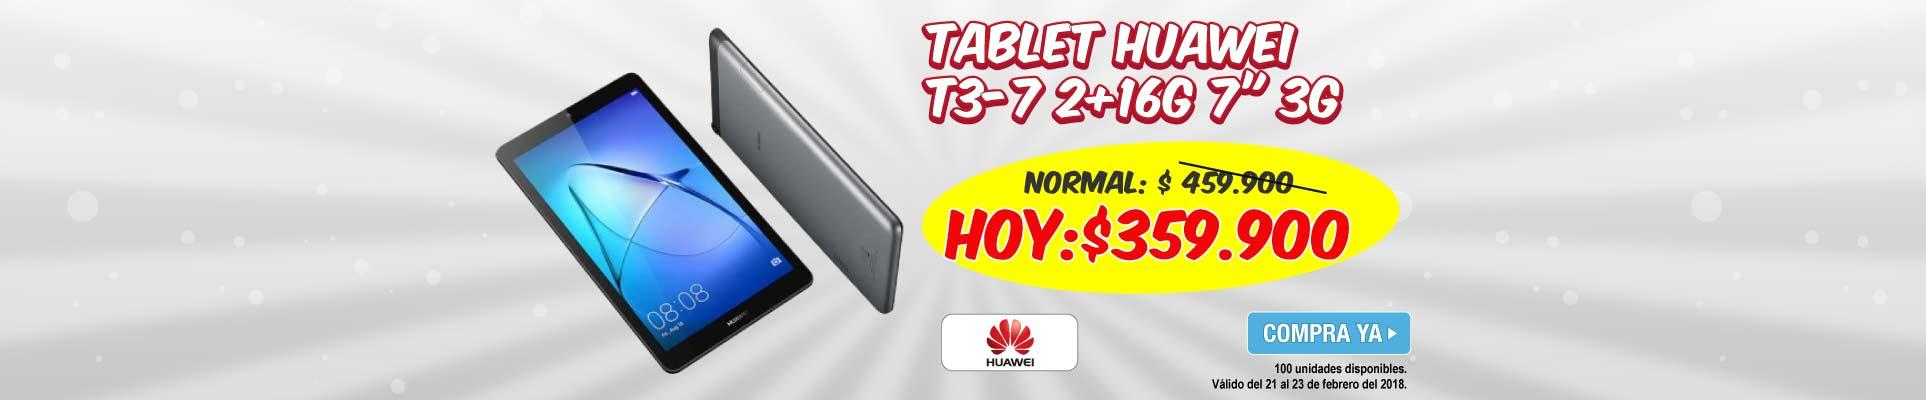 PPAL ALKP-4-tablets-Tablet HUAWEI T3-7 2+16G 7-prod-Febrero21-23